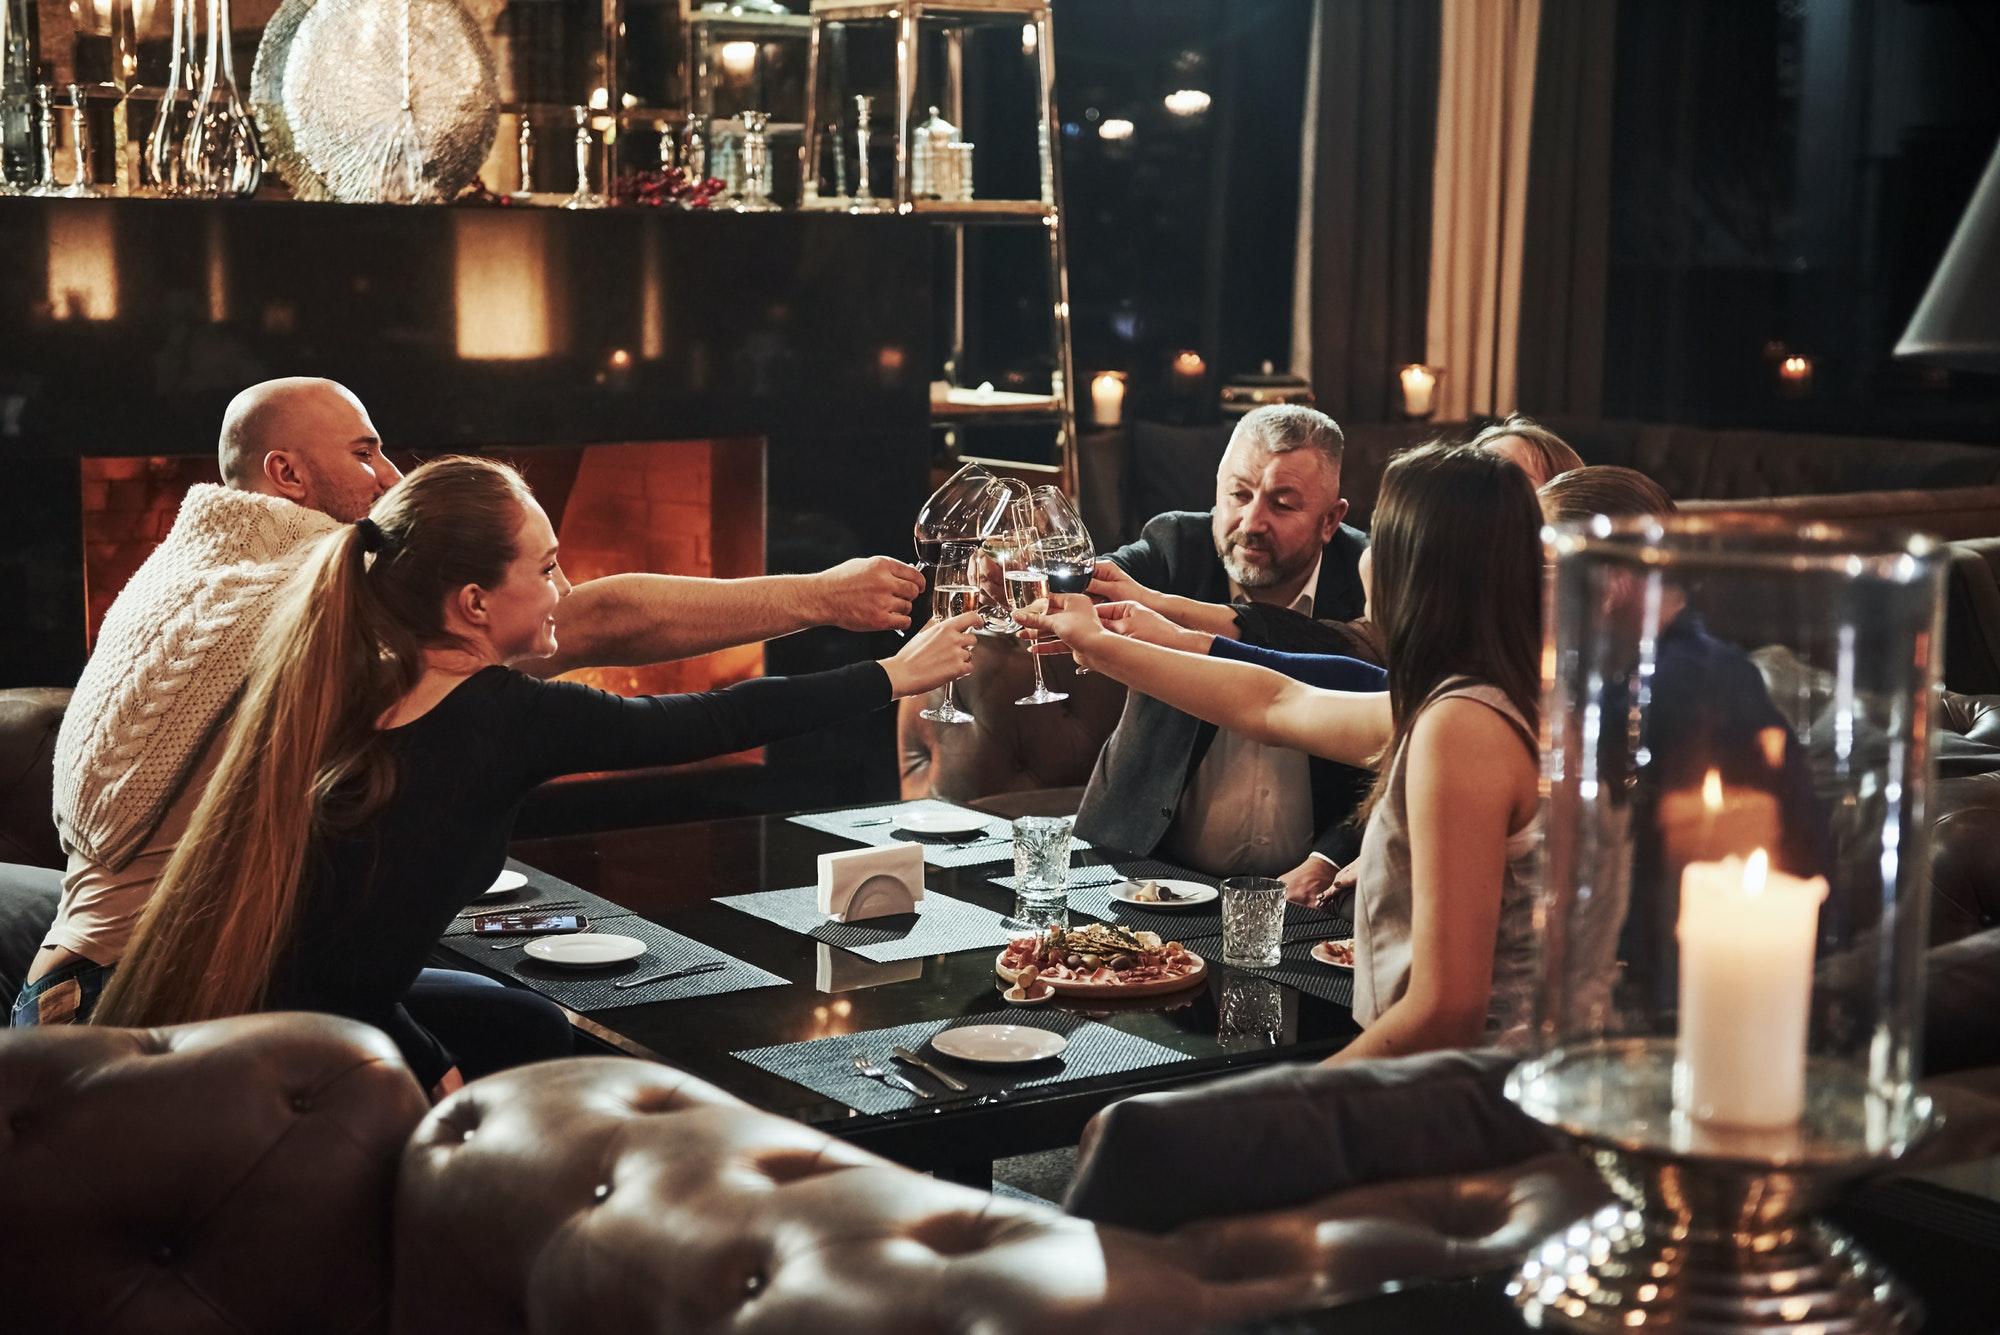 Family friends having nice time in beautiful luxury modern restaurant